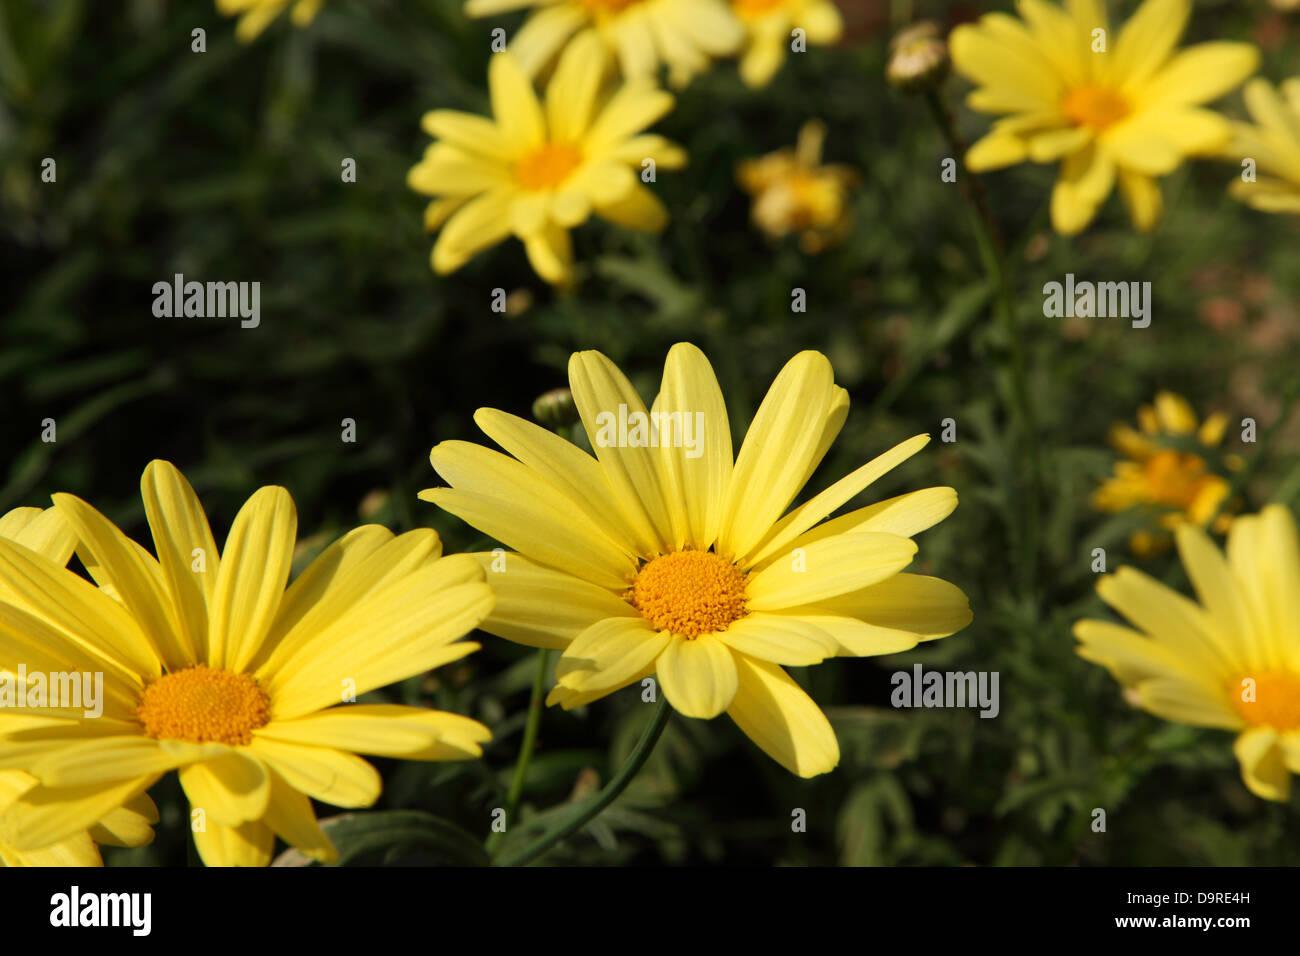 Marguerite (Argyranthemum) flowers, belonging to the family Asteraceae. - Stock Image